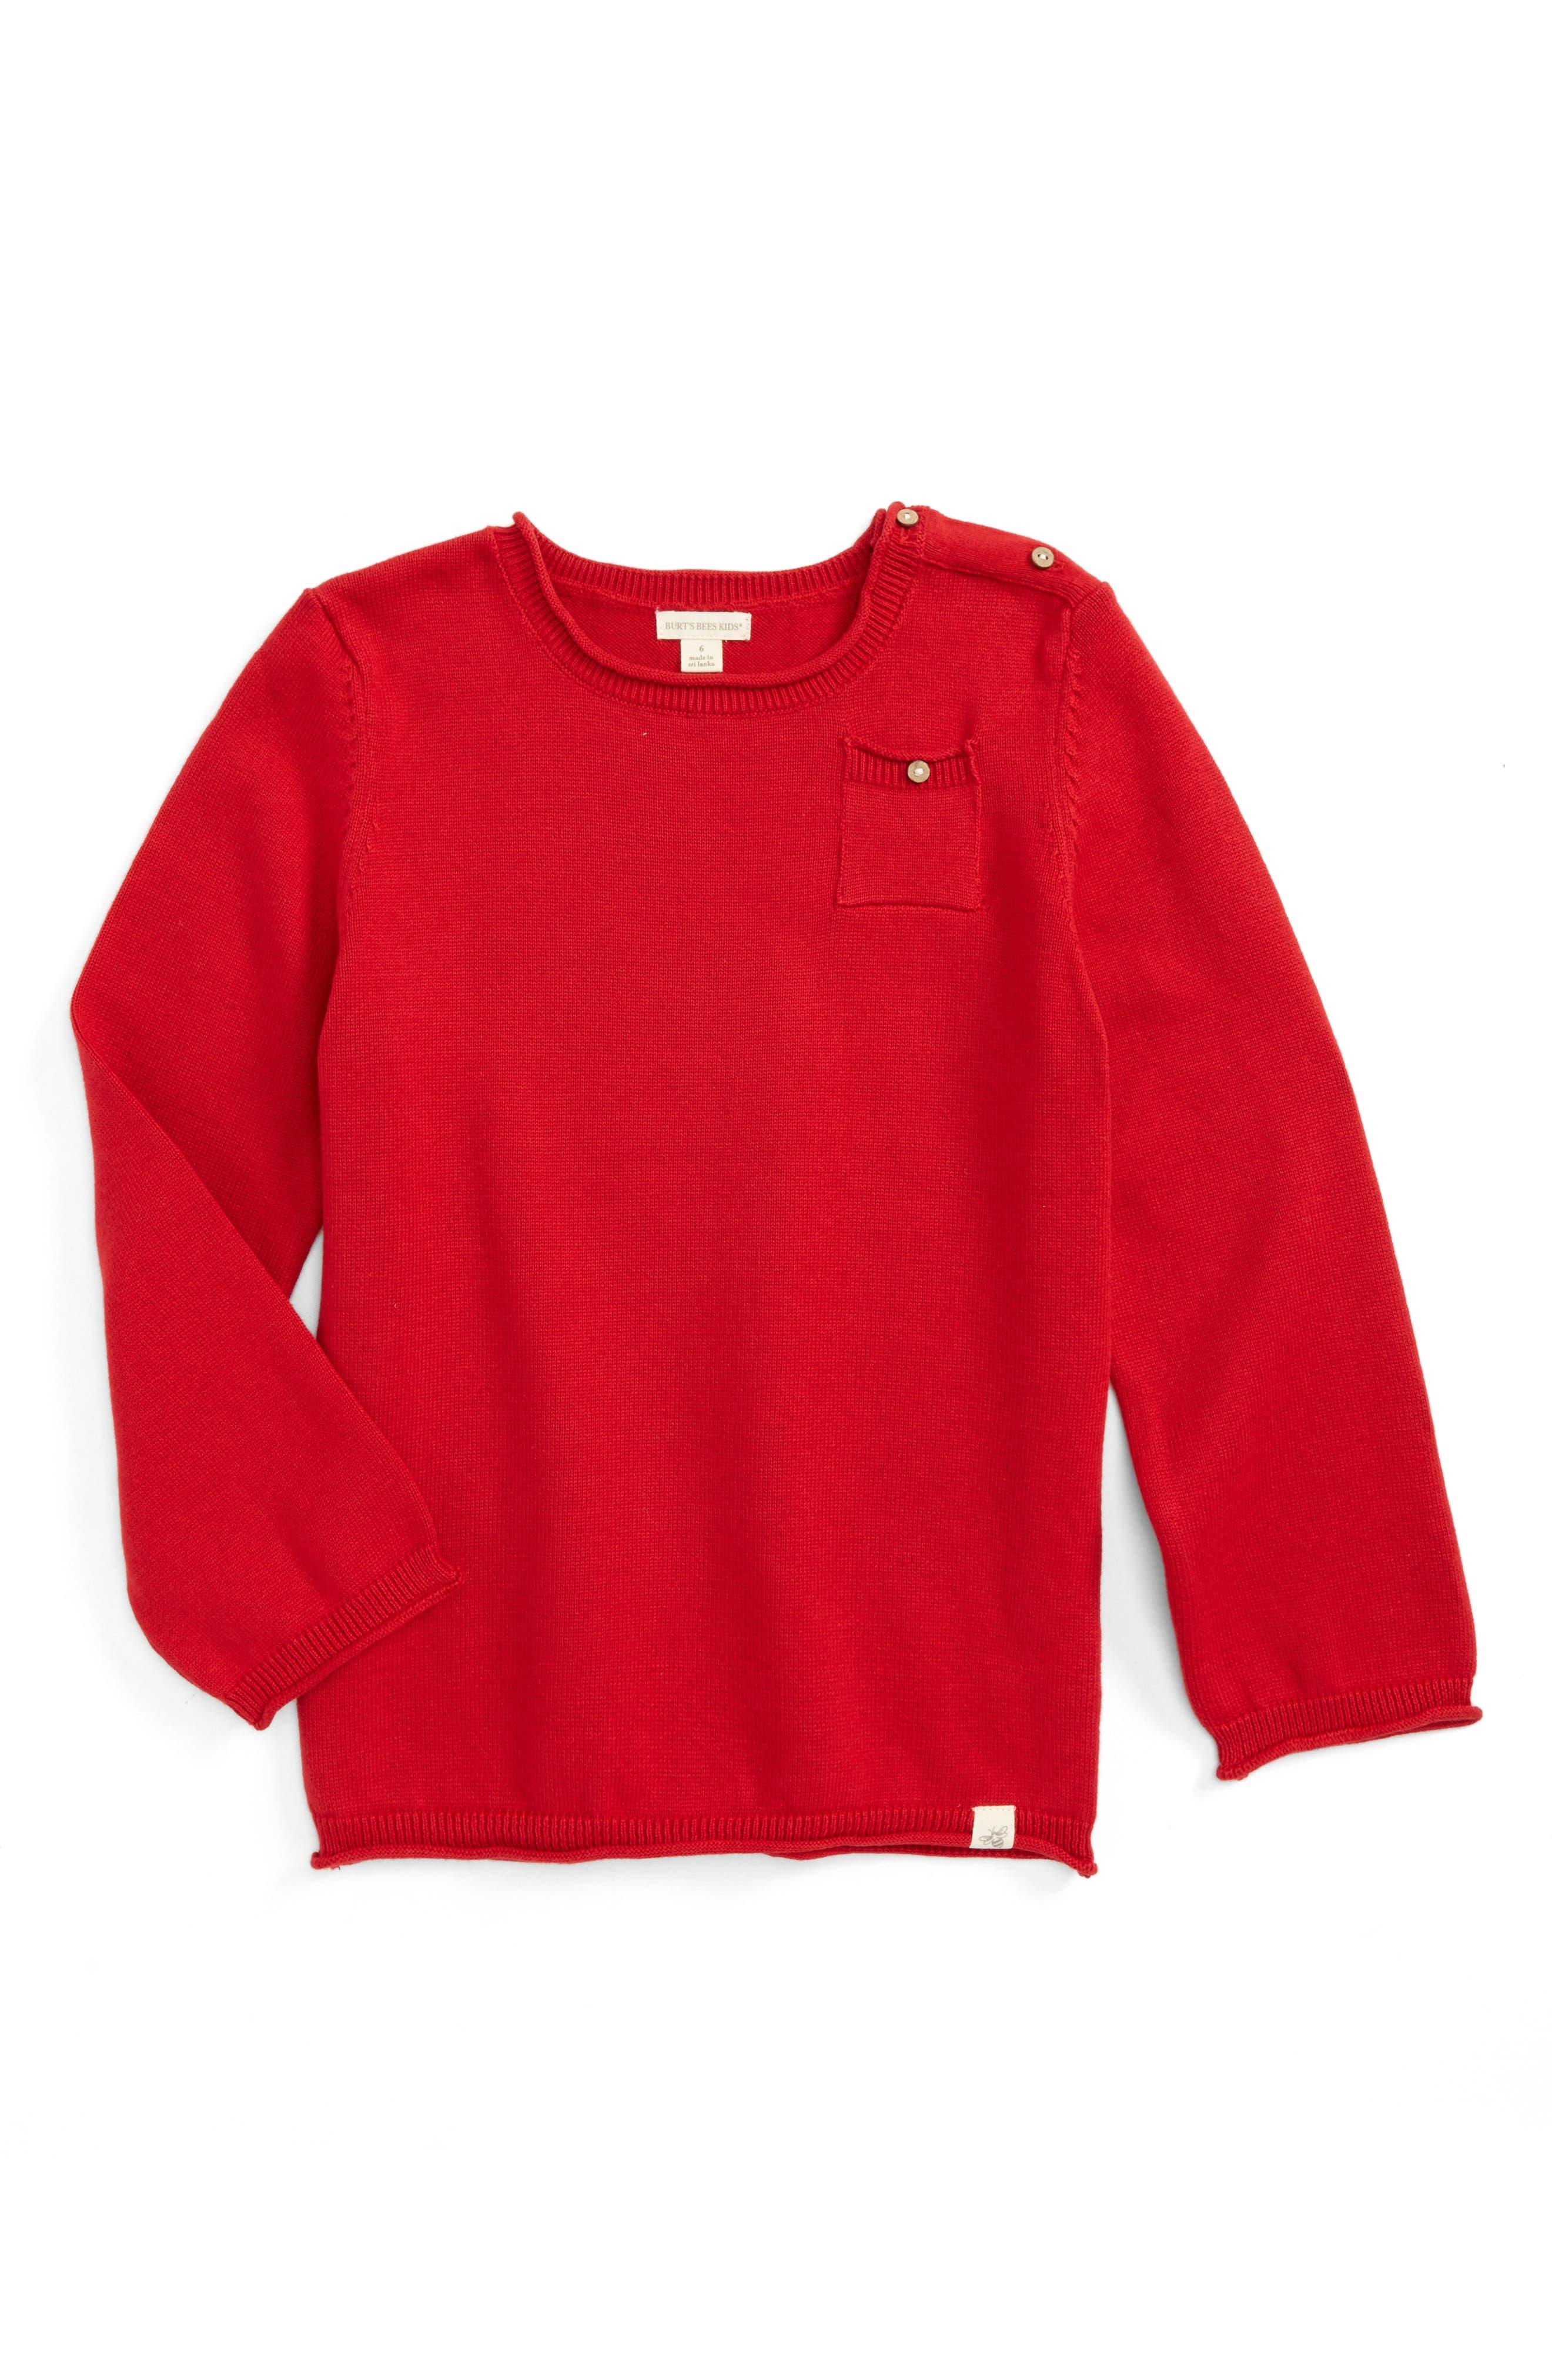 Main Image - Burt's Bees Baby Pocket Organic Cotton Sweater (Toddler Boys & Big Boys)